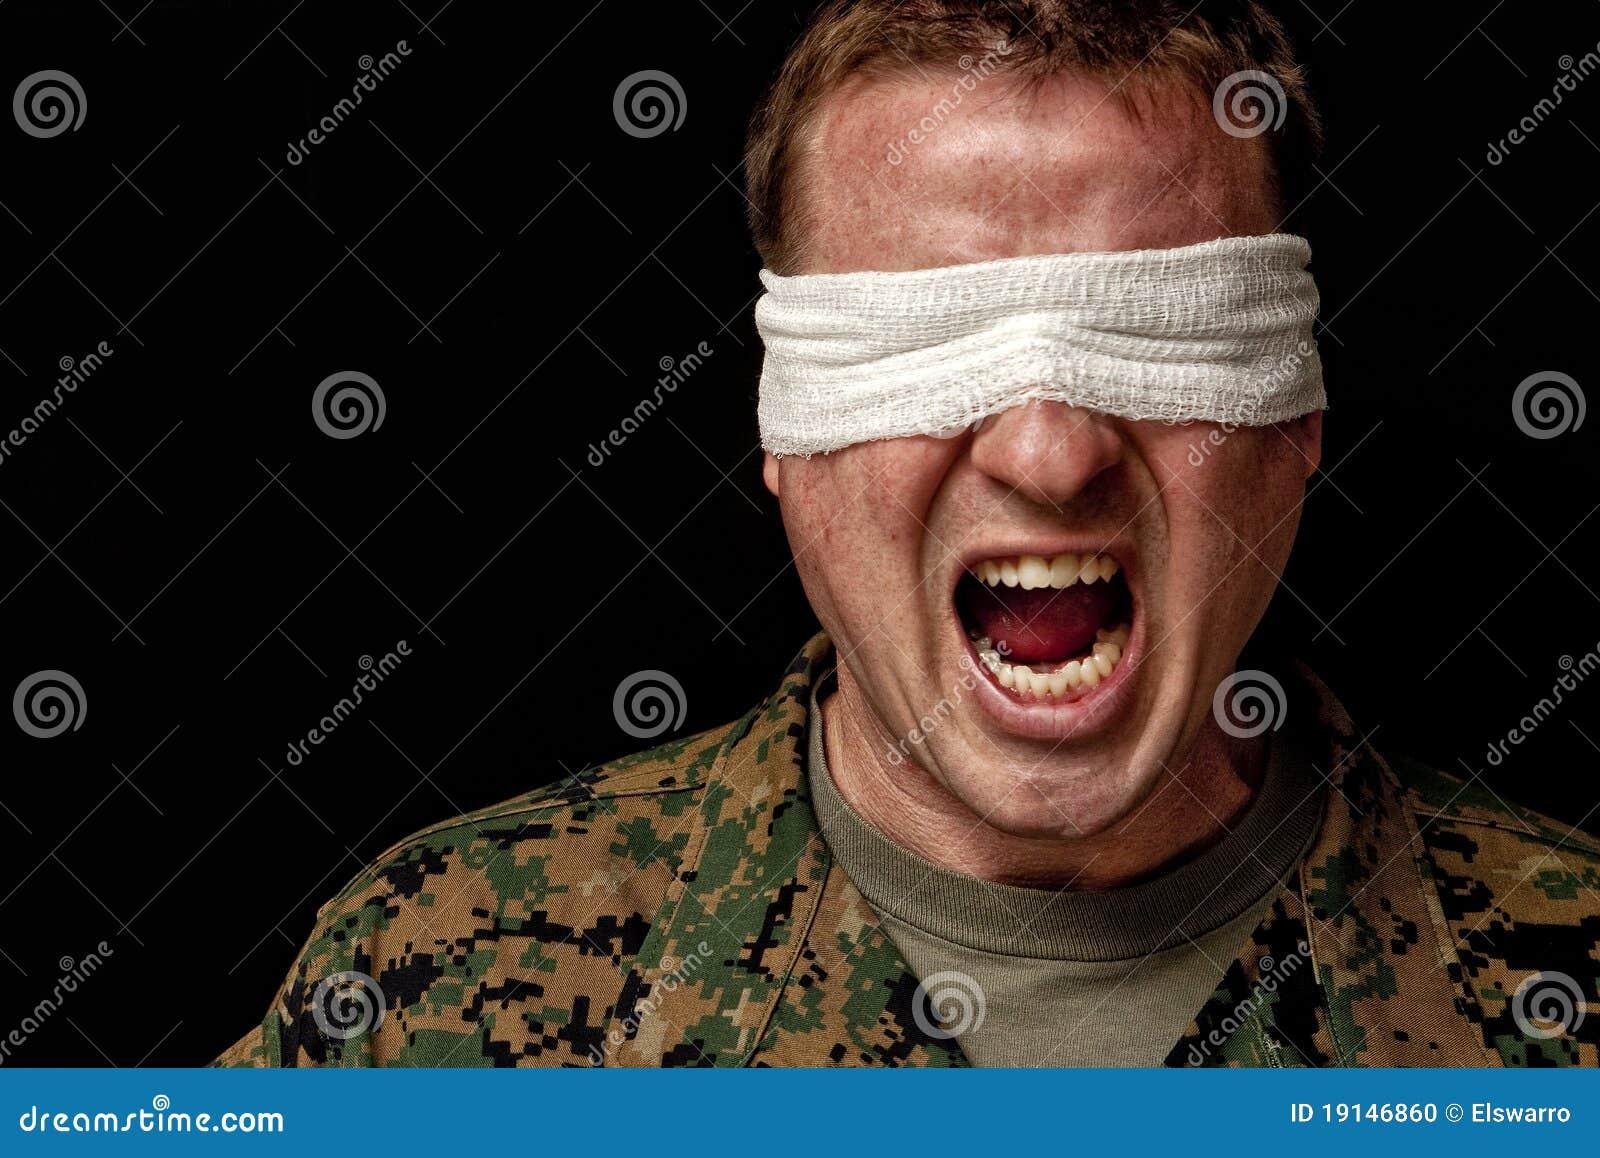 Soldat leidet unter PTSD